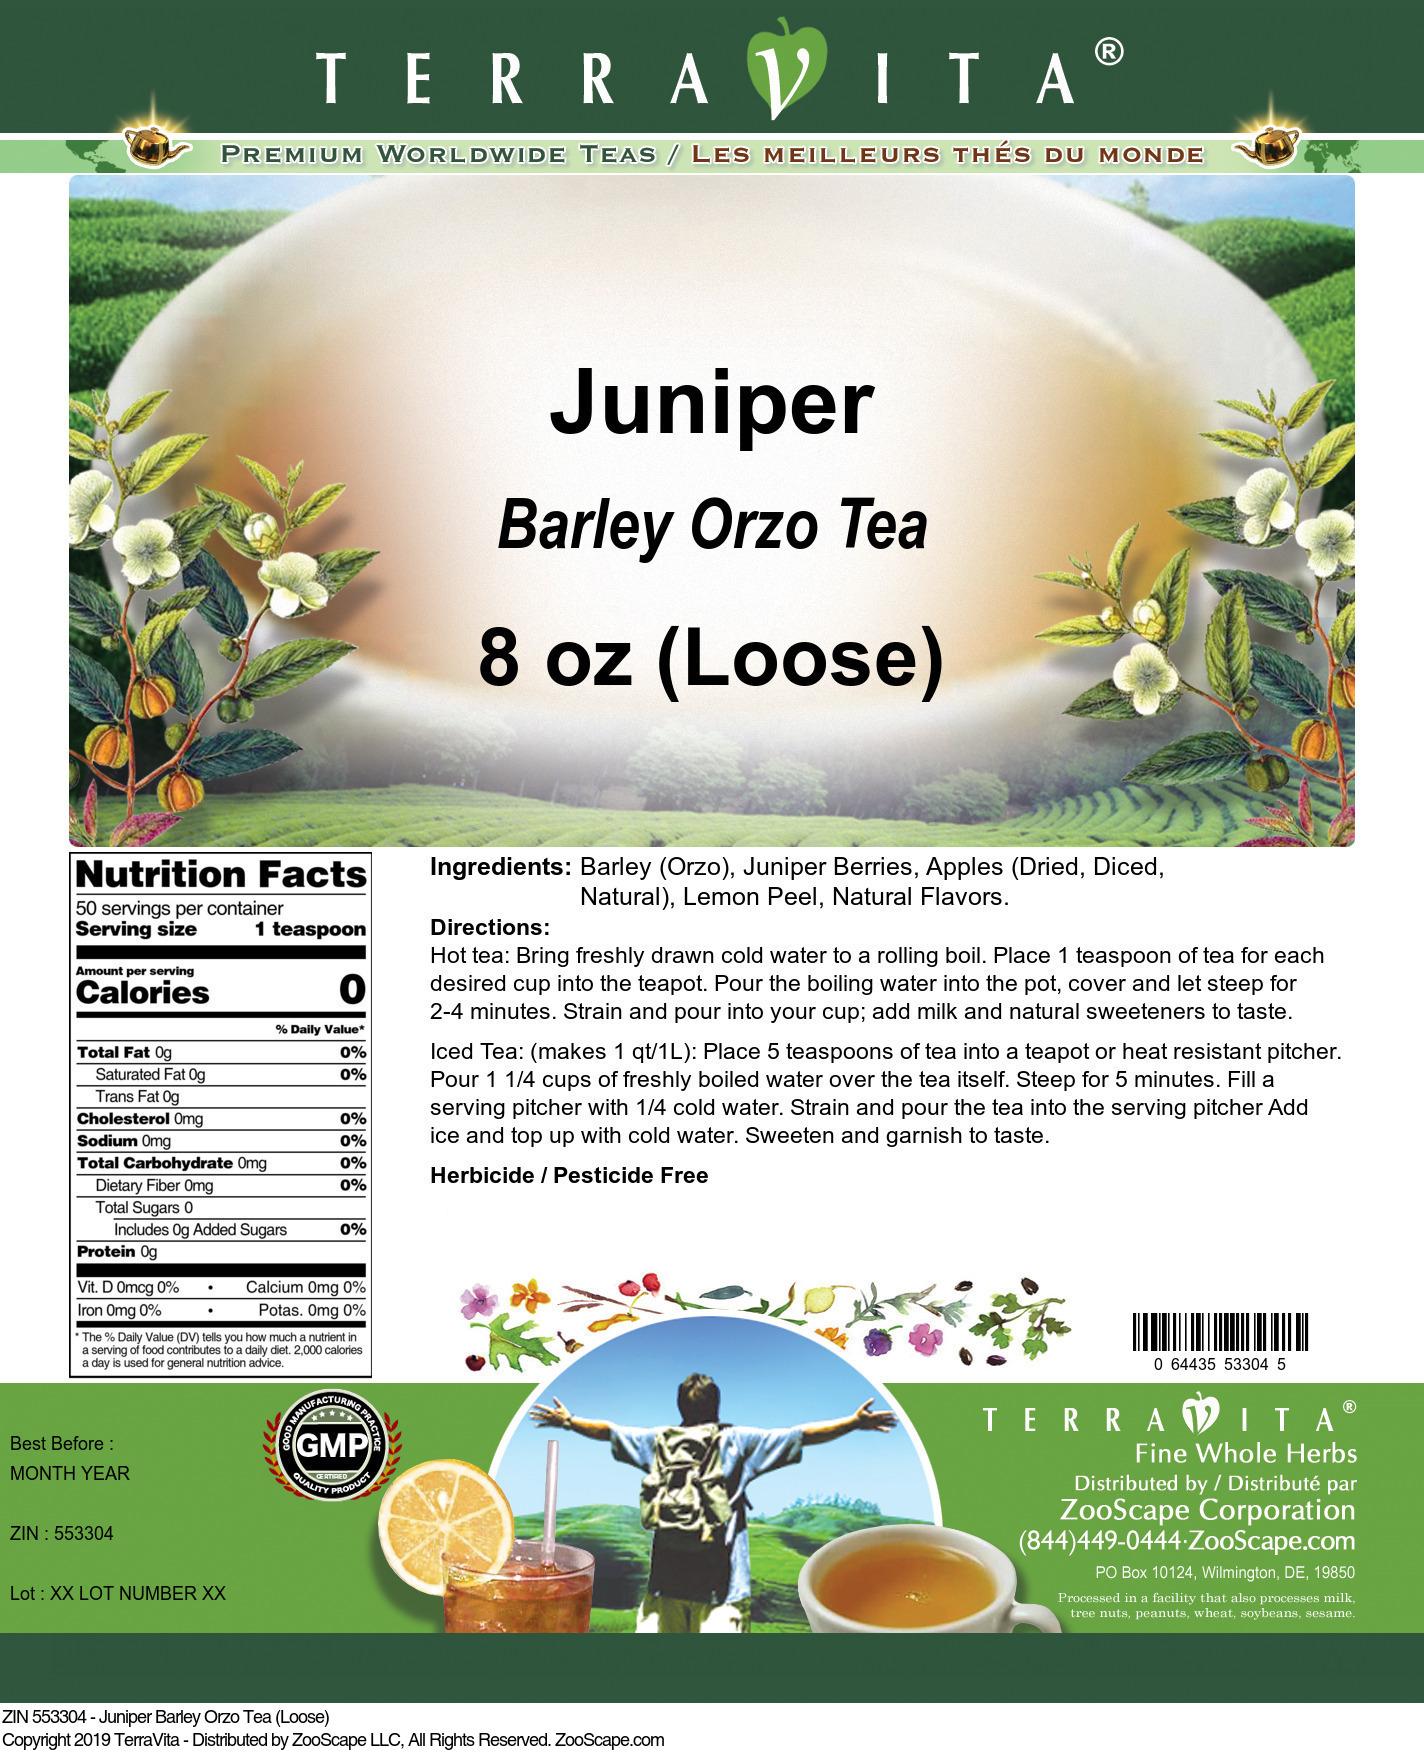 Juniper Barley Orzo